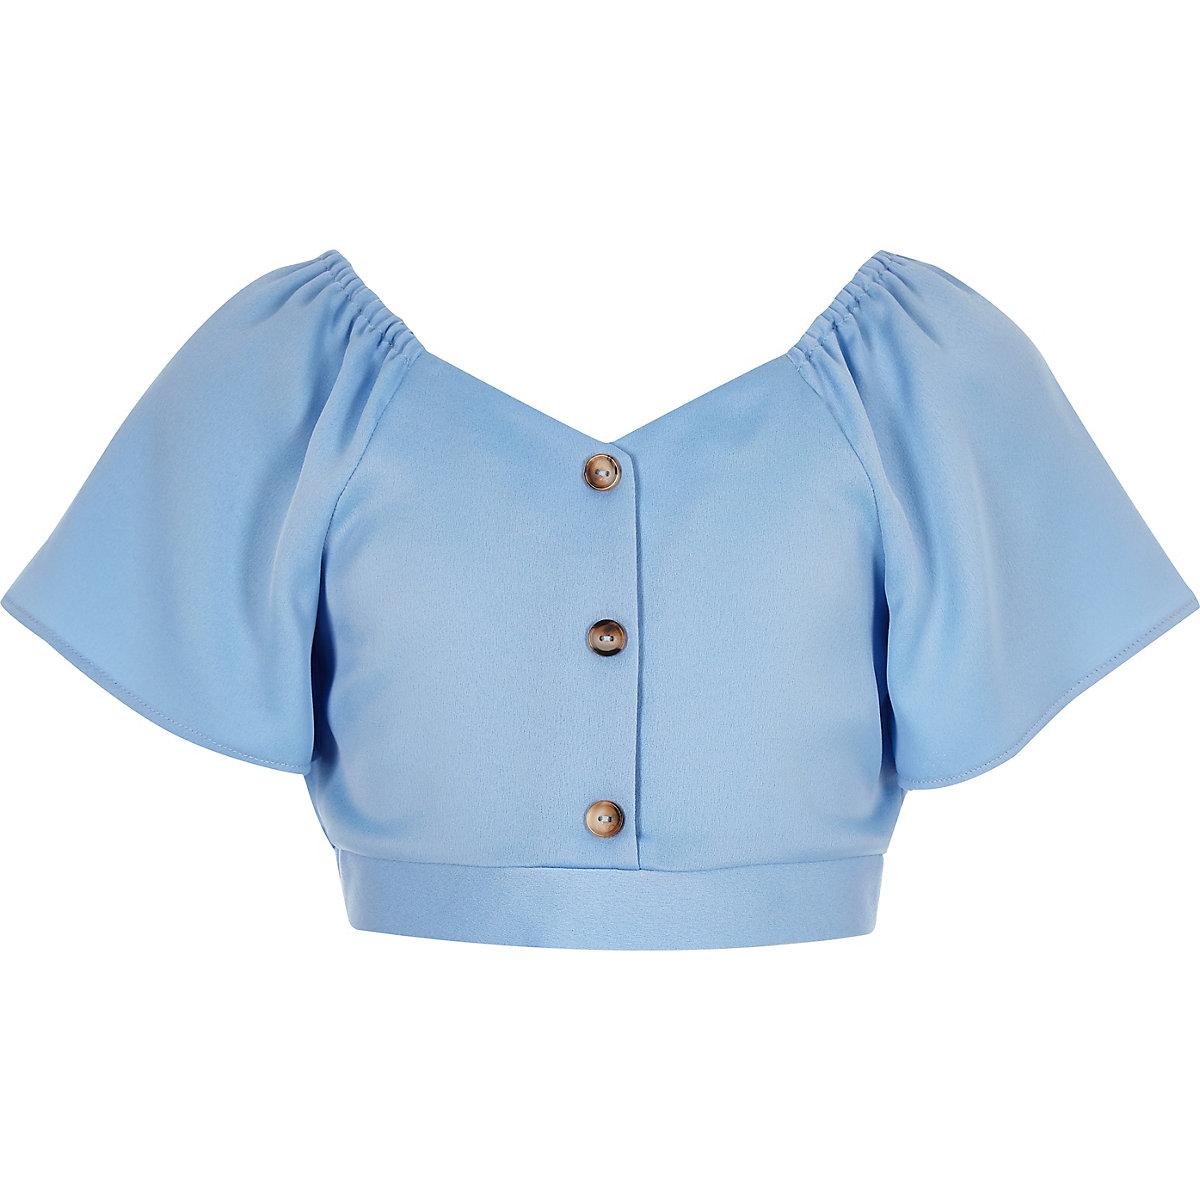 Girls blue button front top